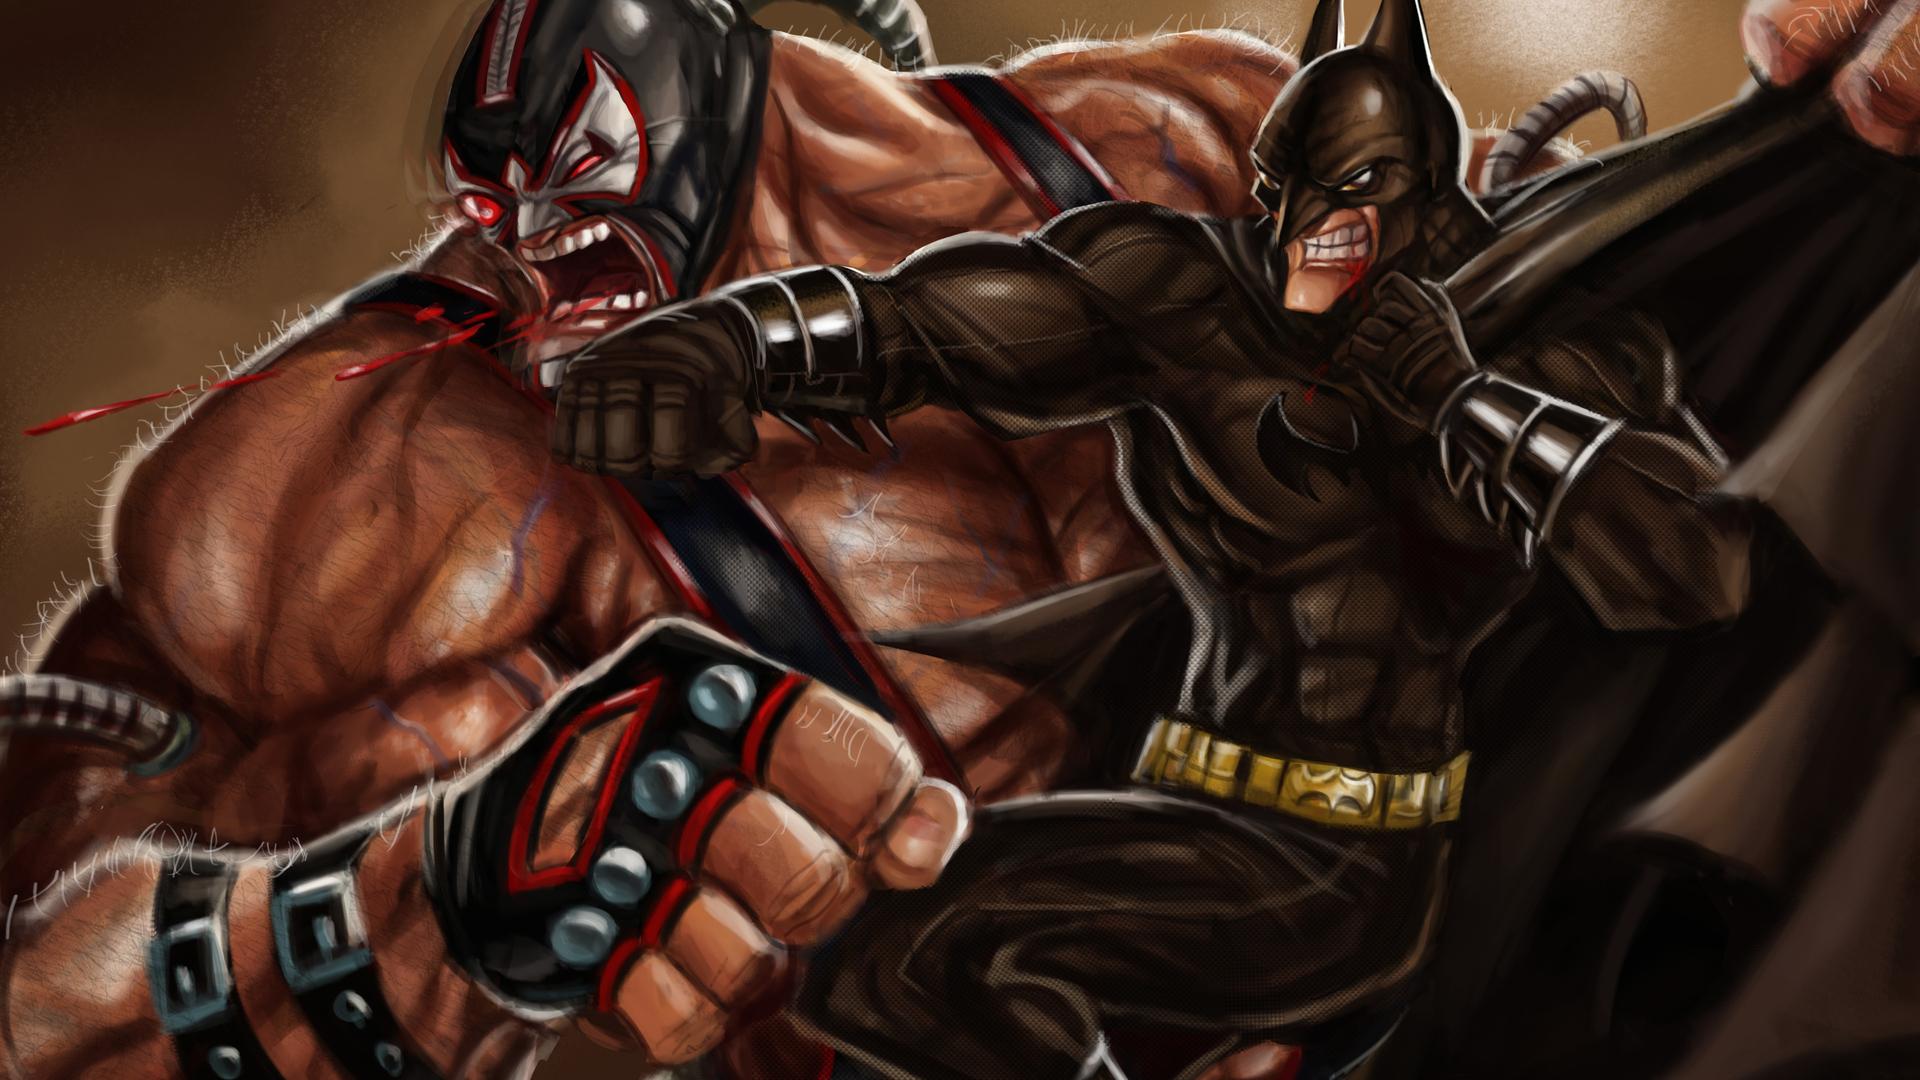 batman-and-bane4k-art-kf.jpg